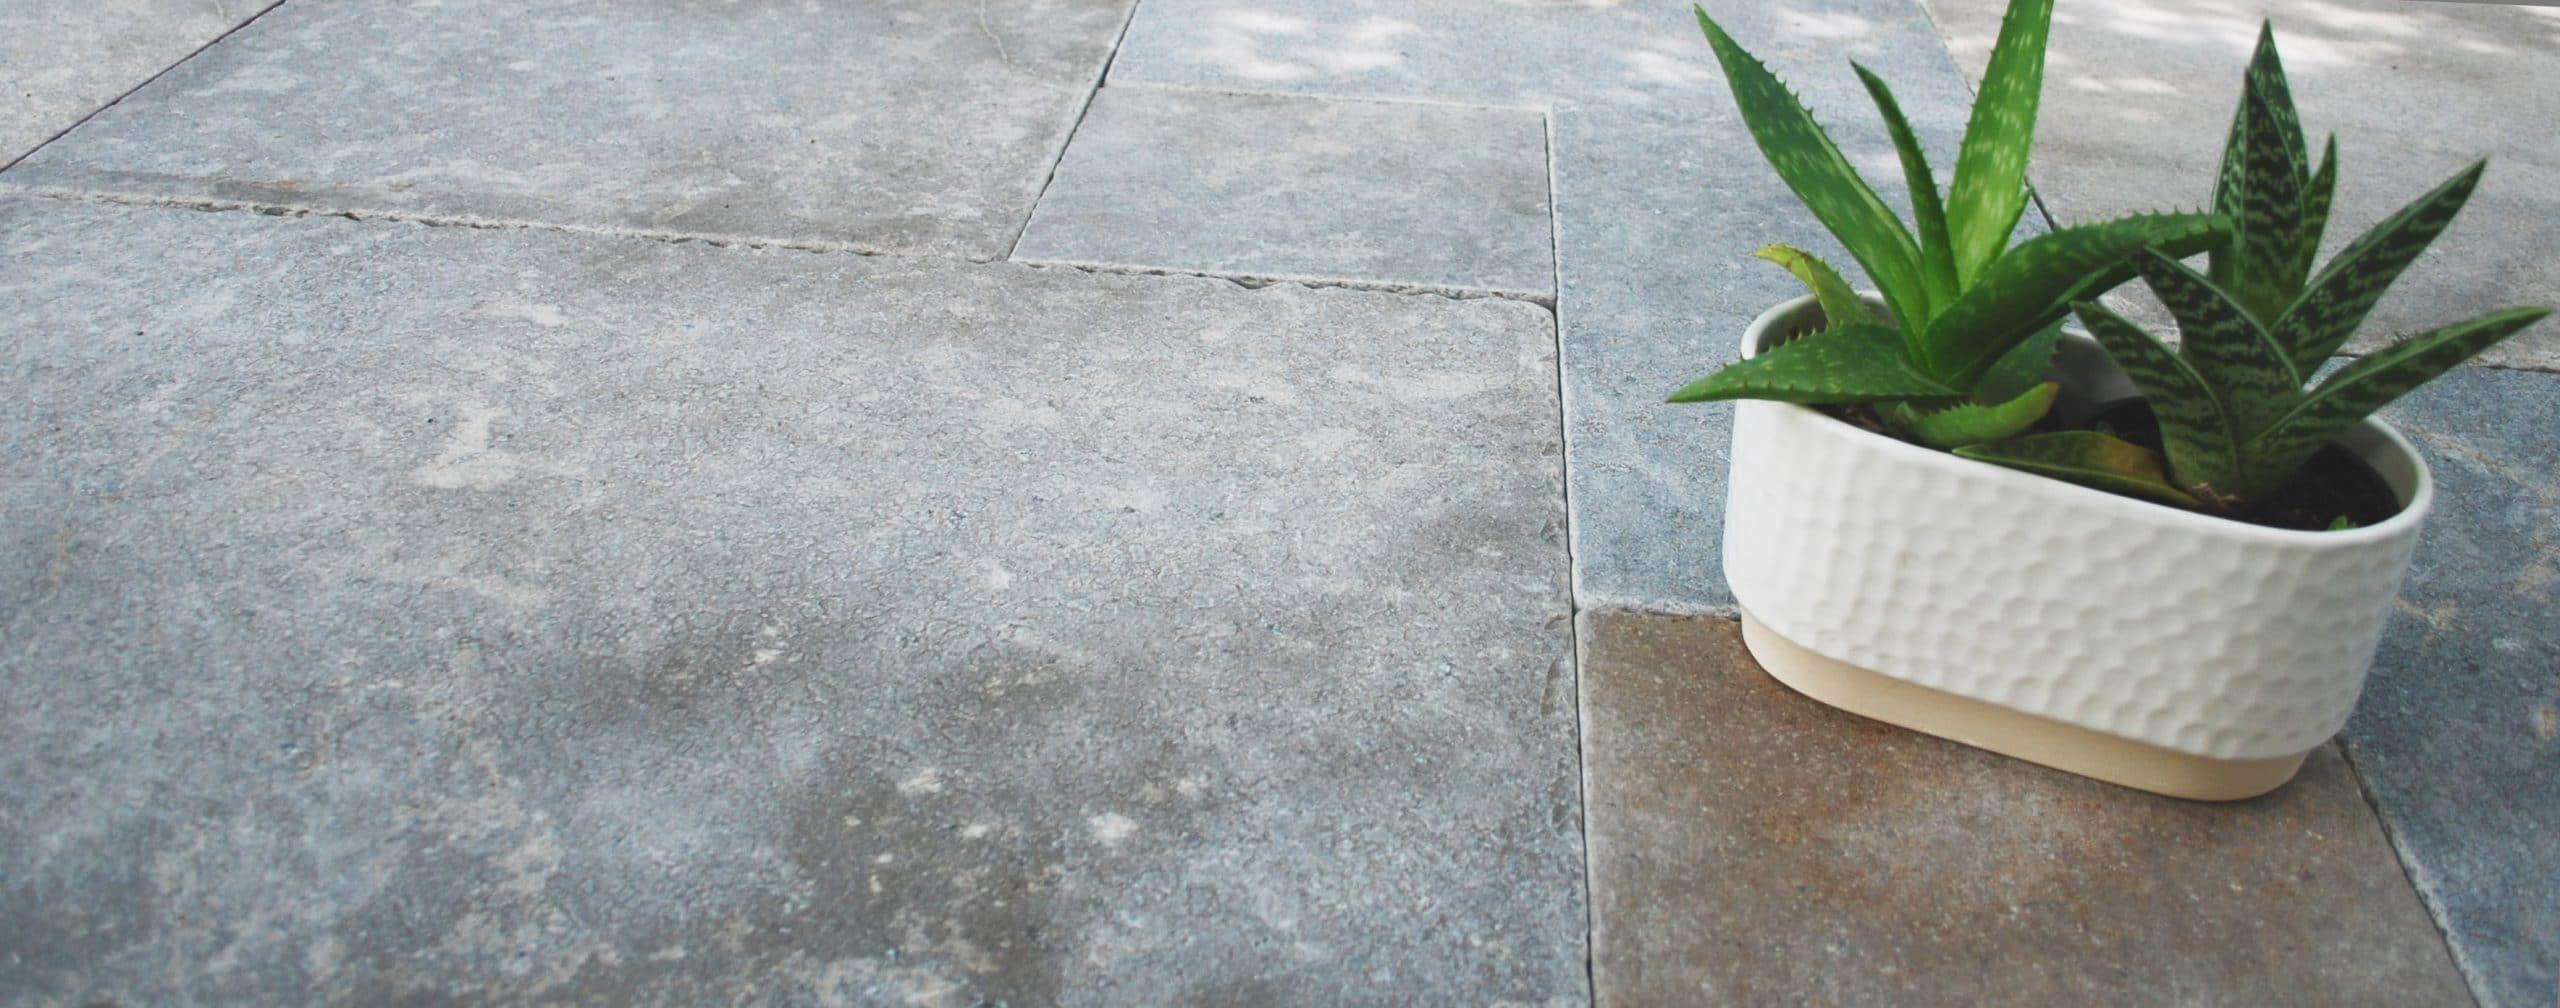 Nos pierres naturelles grises